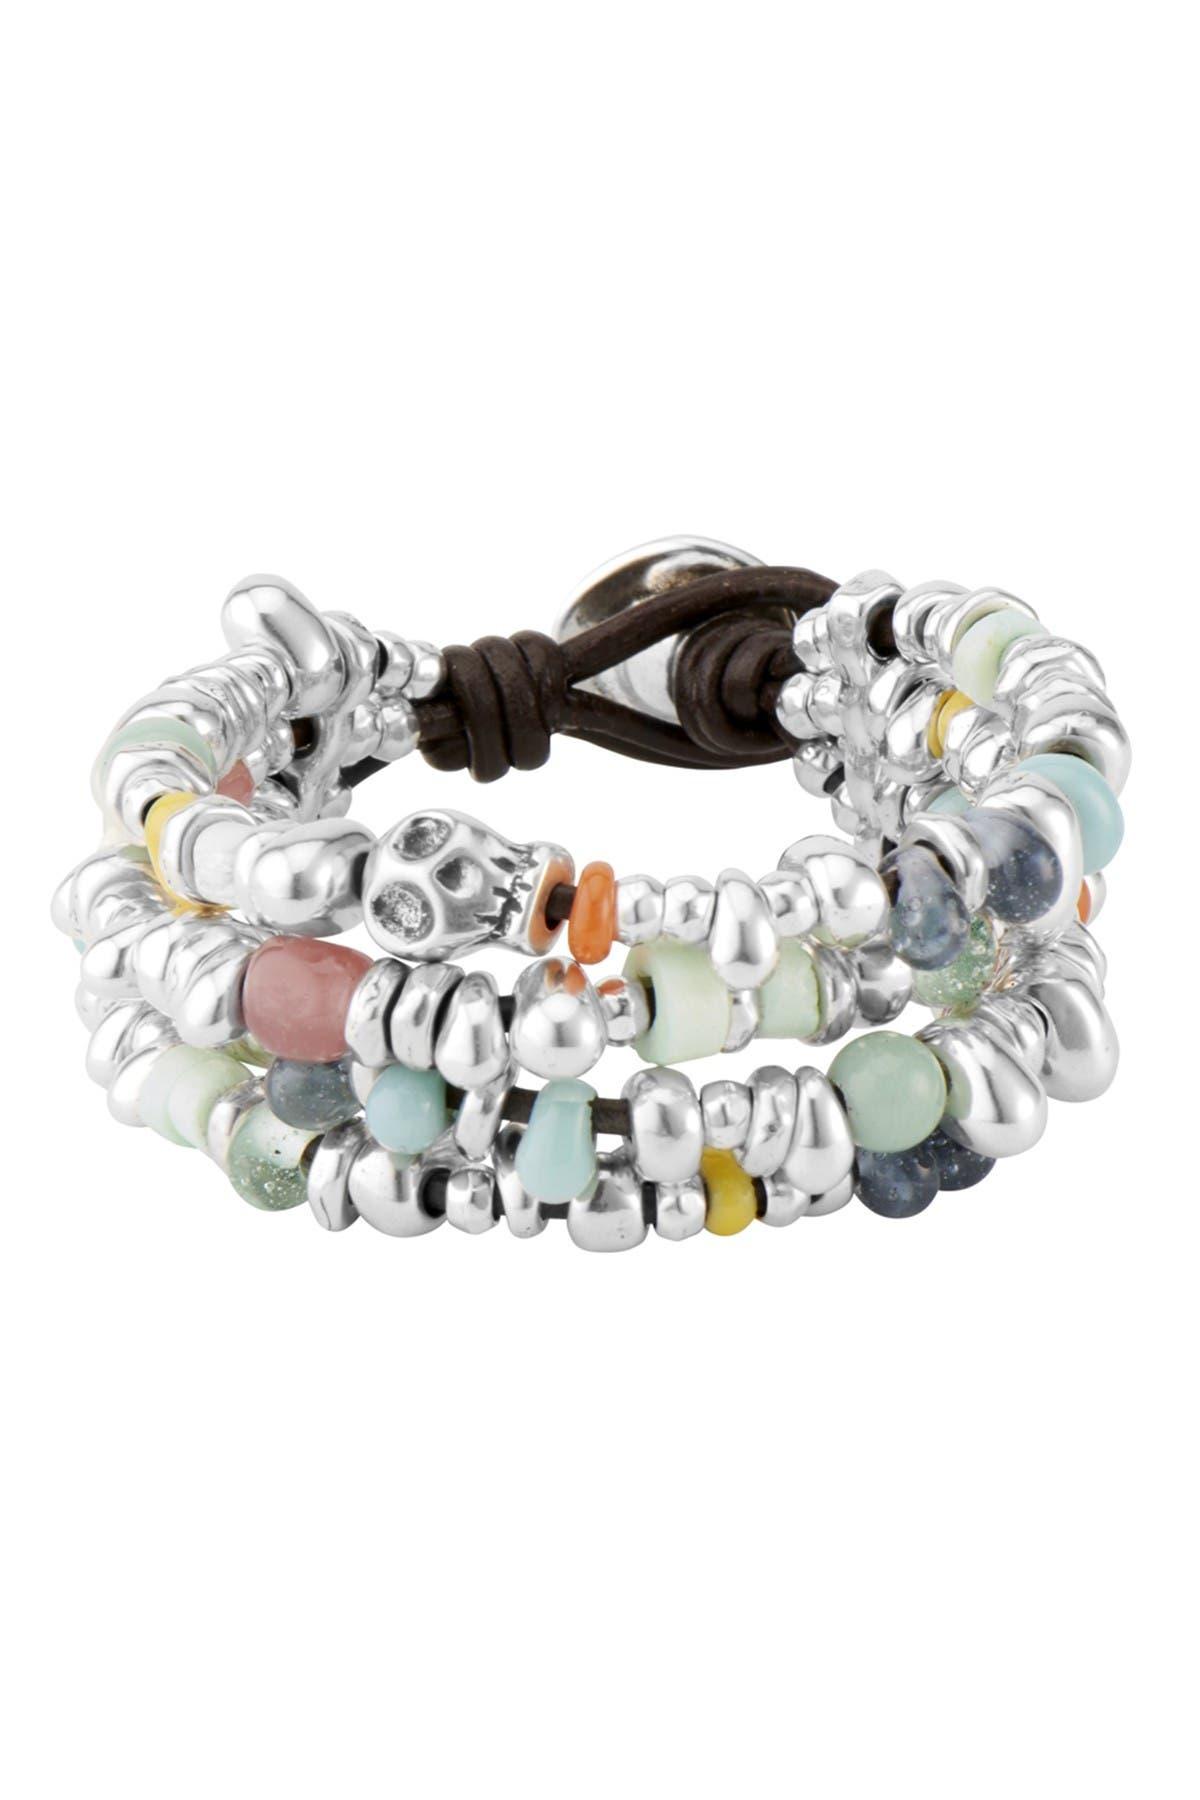 Image of Uno De 50 Loot Silver Plated Bracelet